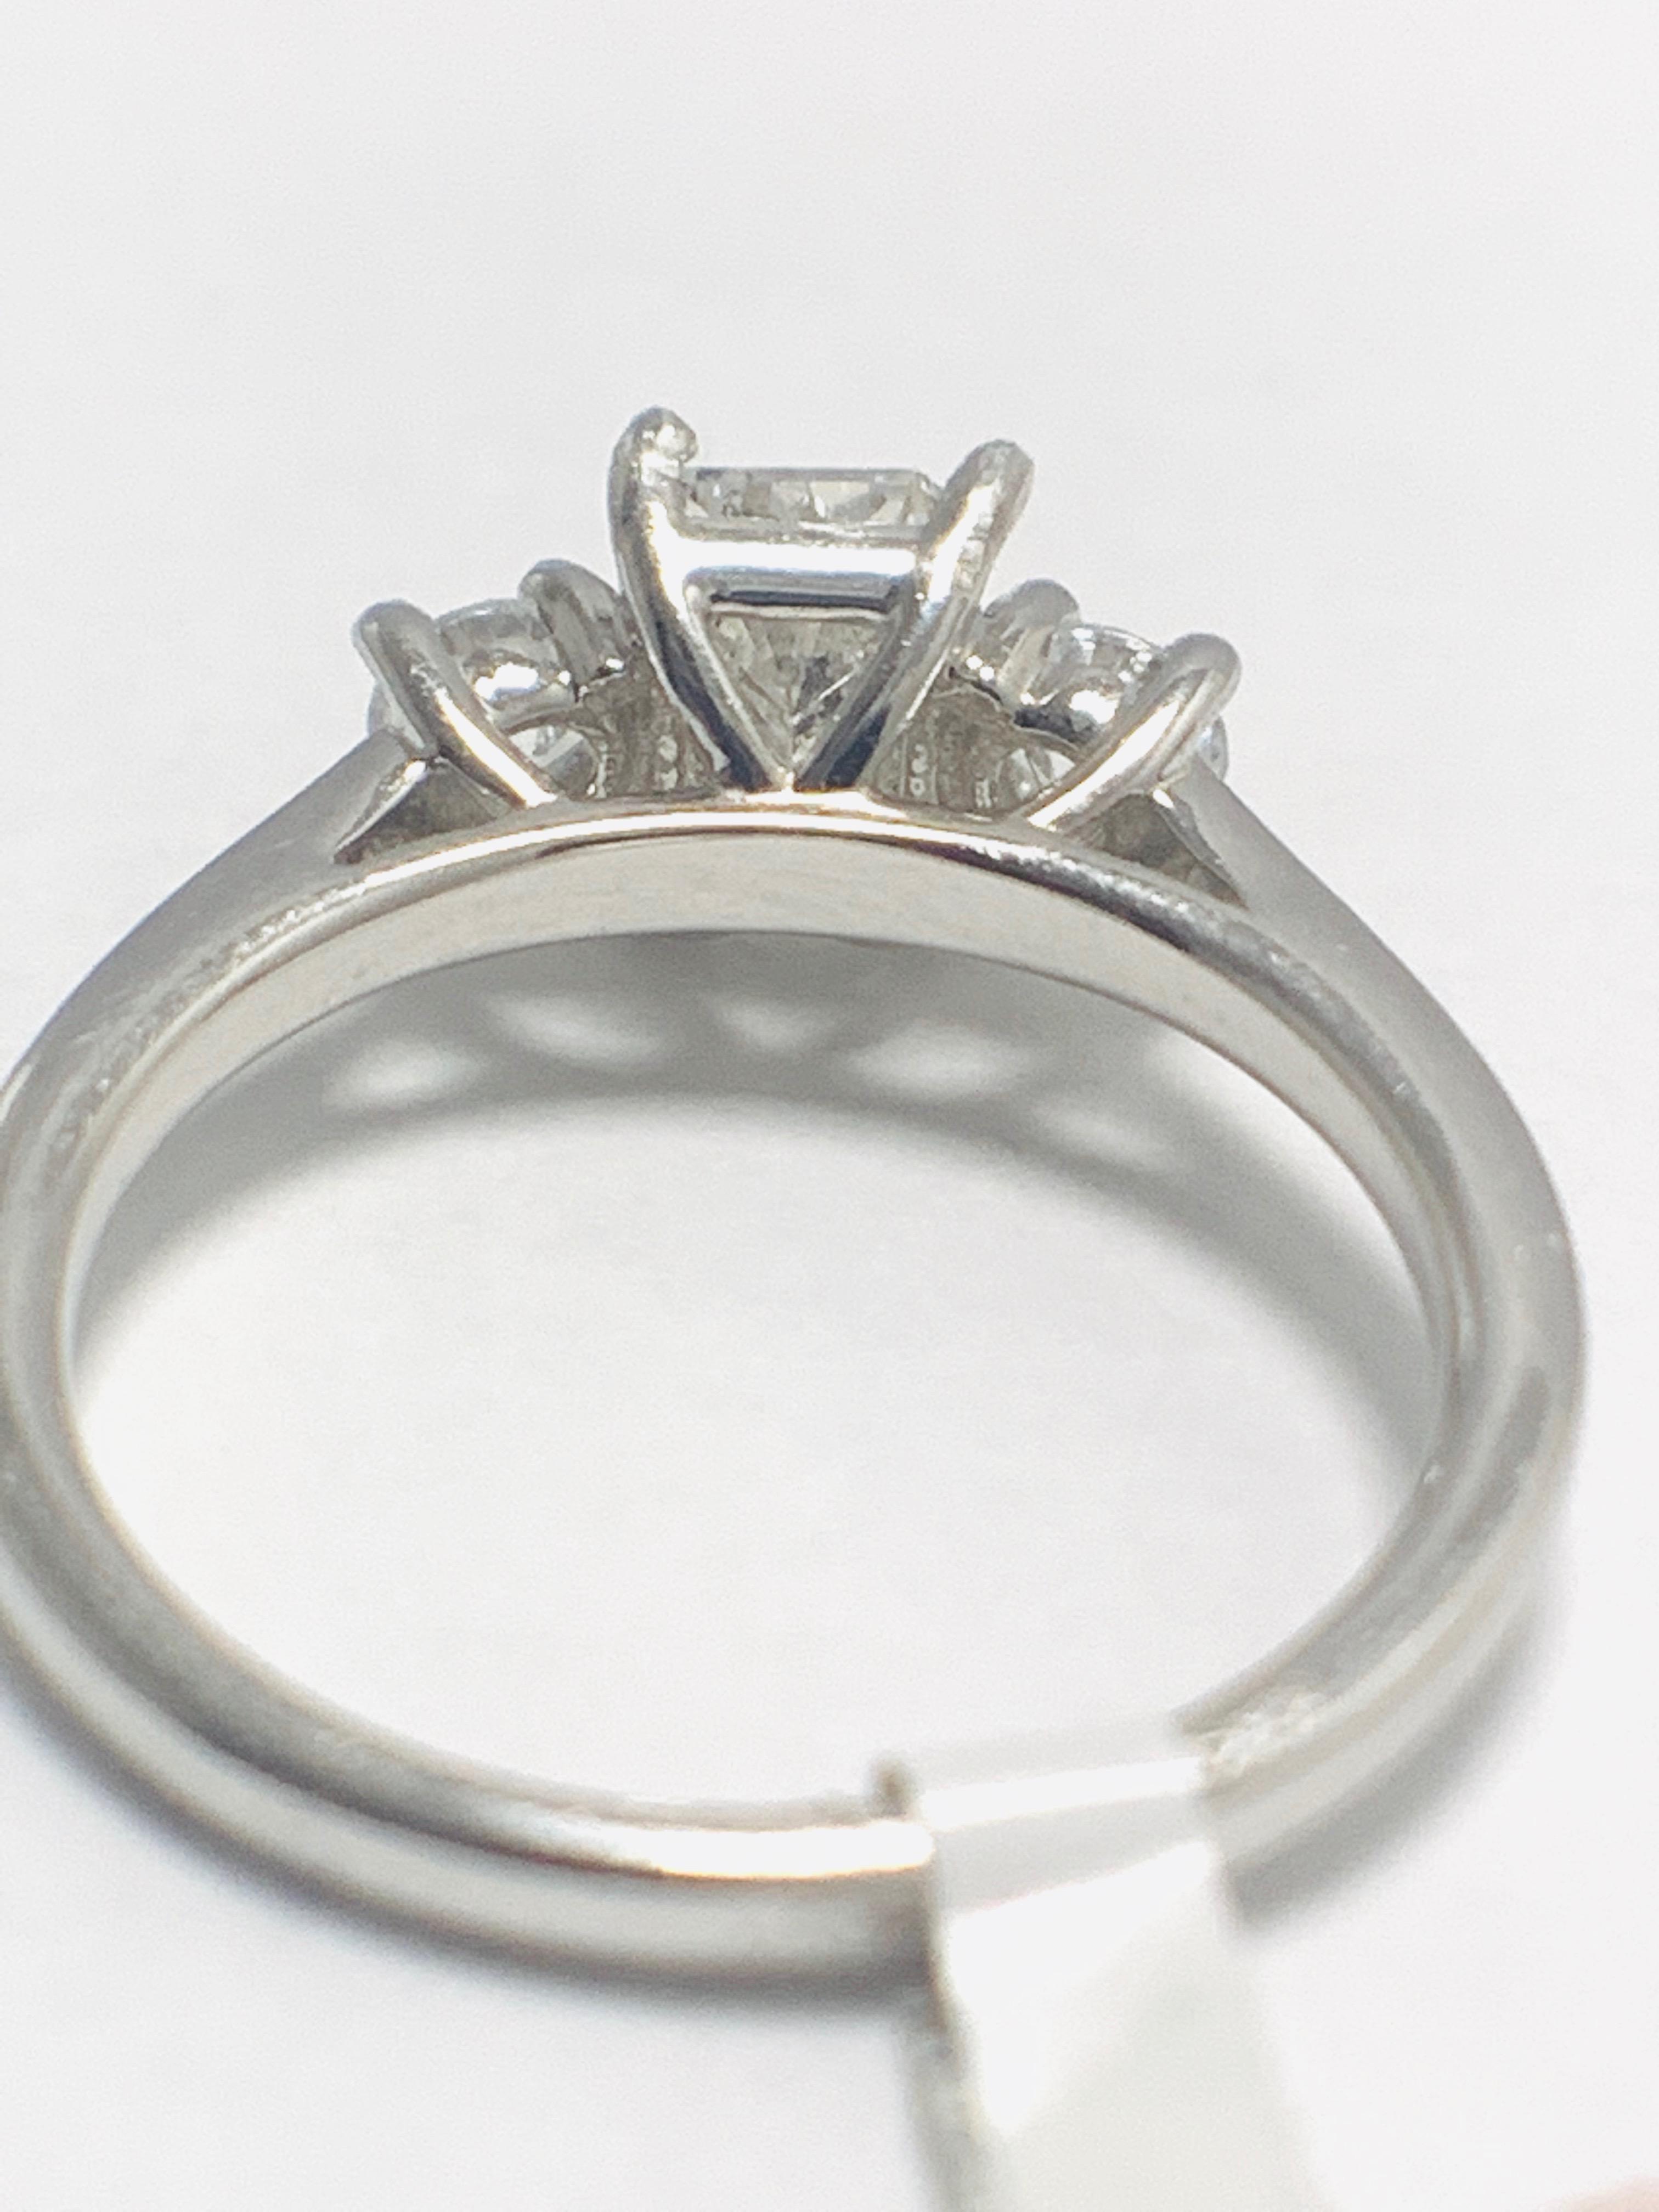 1.50ct trilogy platinum diamond ring - Image 6 of 10